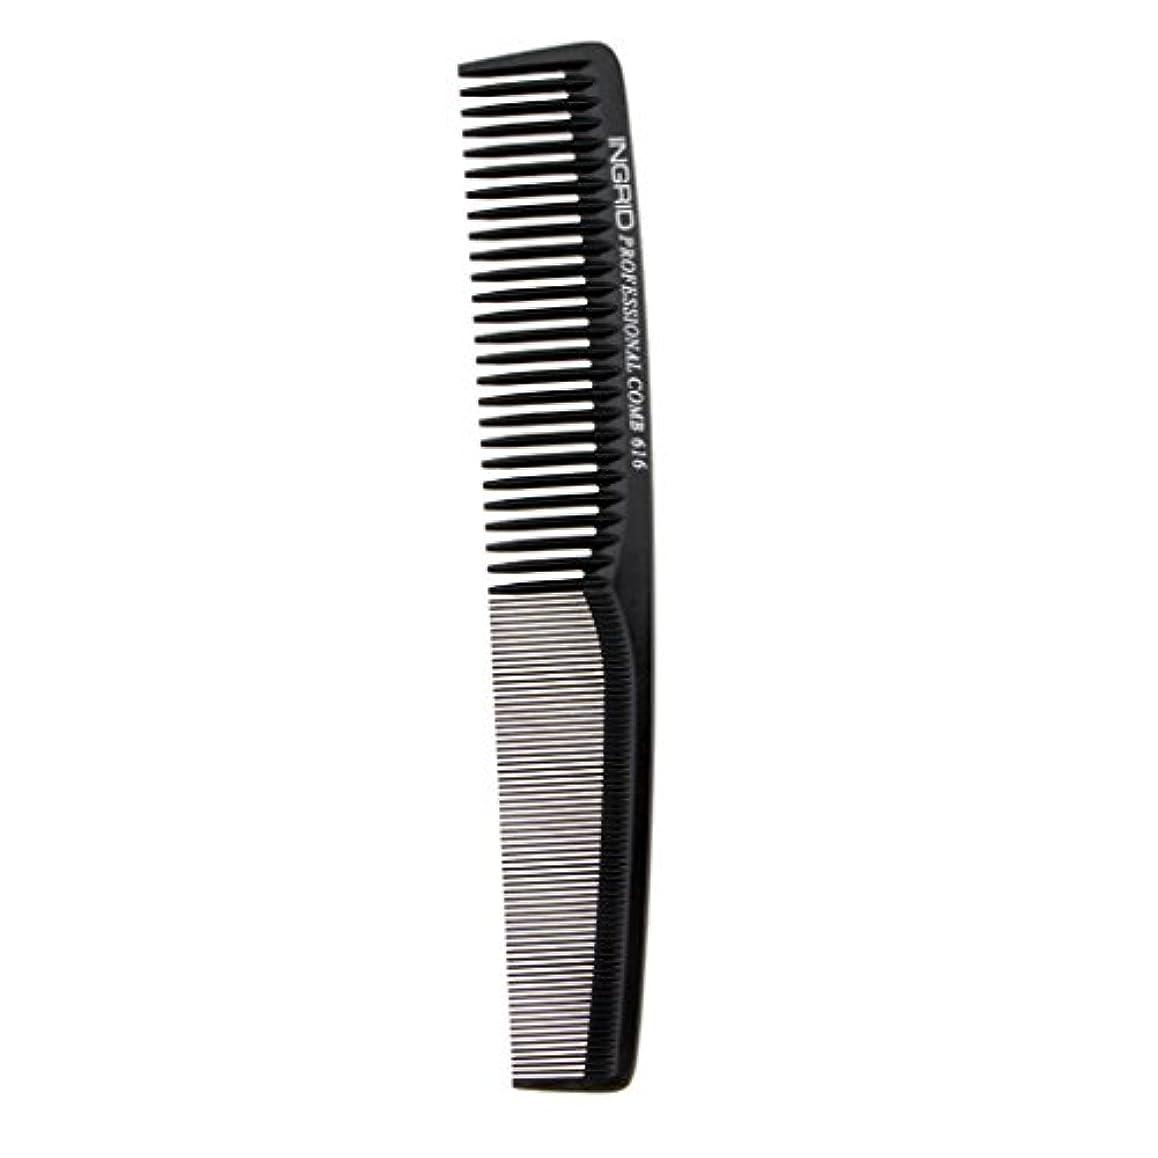 Fenteer ヘアカットコーム 櫛 コーム 理髪店 ヘアケア 便利 全5色  - ブラック